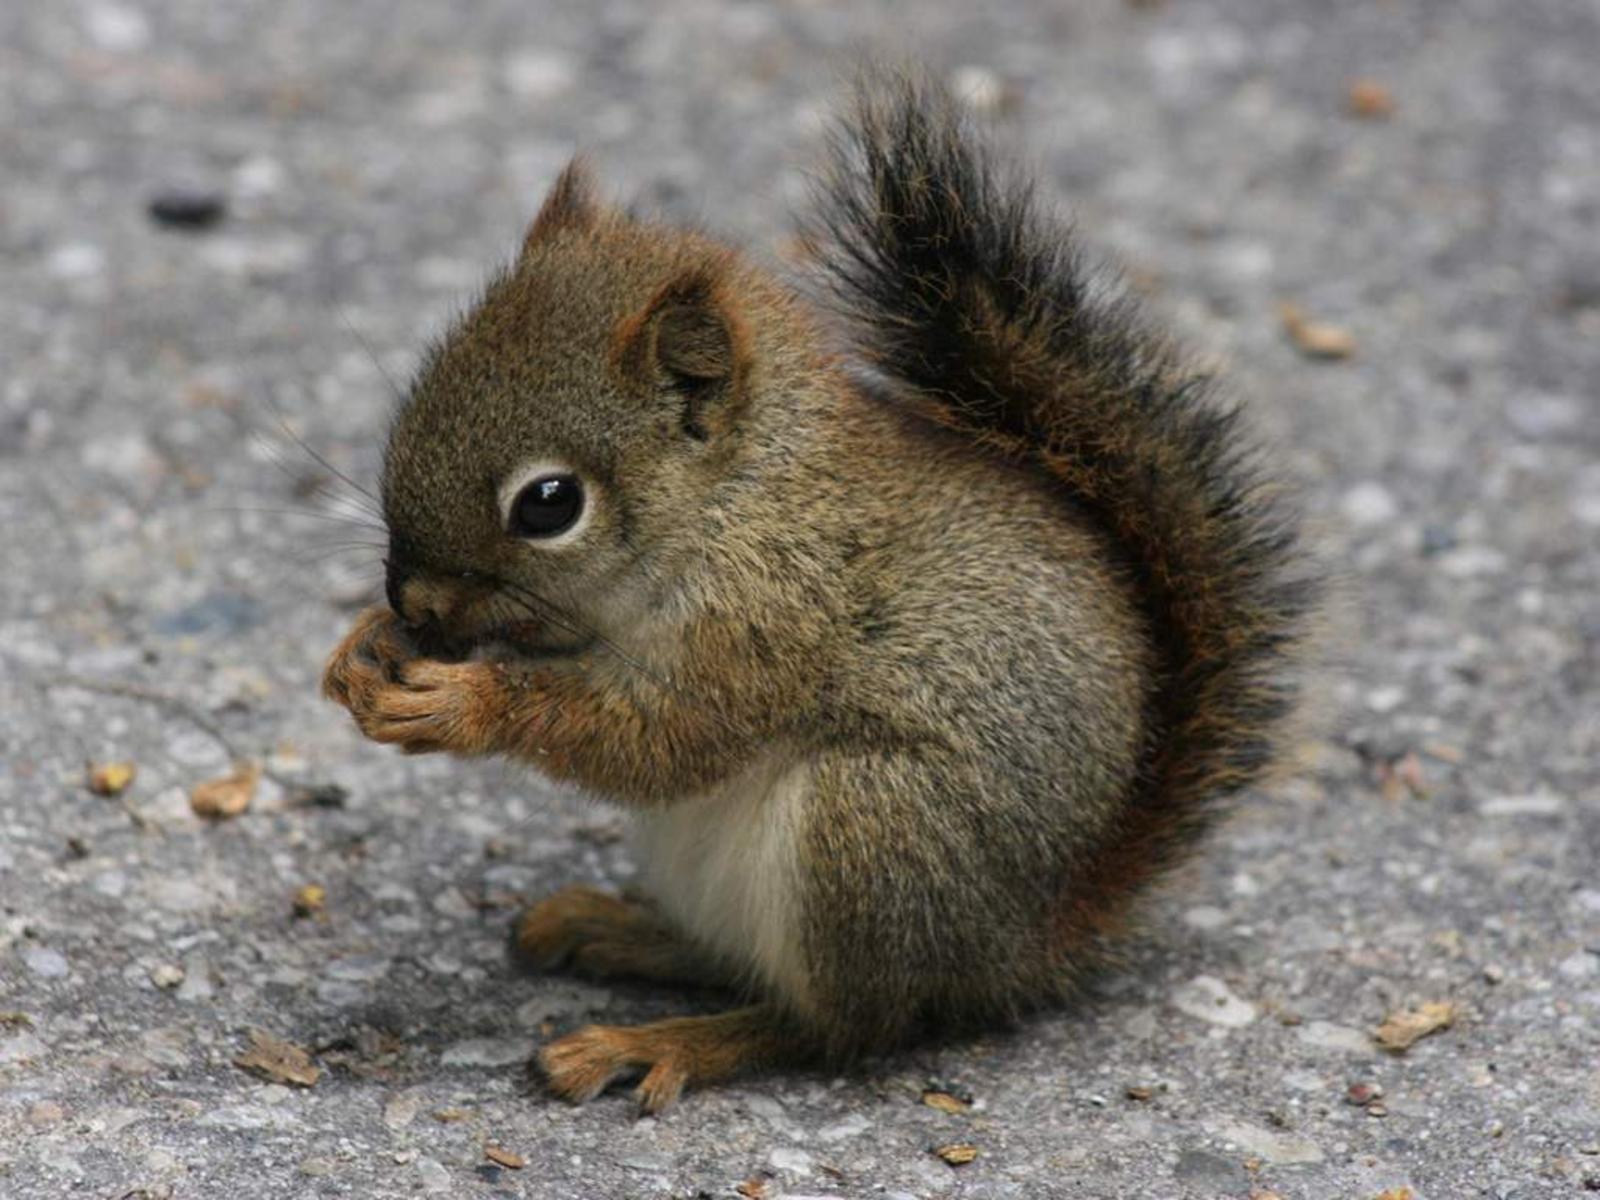 Desktop Wallpapers Baby Squirrel Cute Animal Wallpaper   iWallScreen 1600x1200